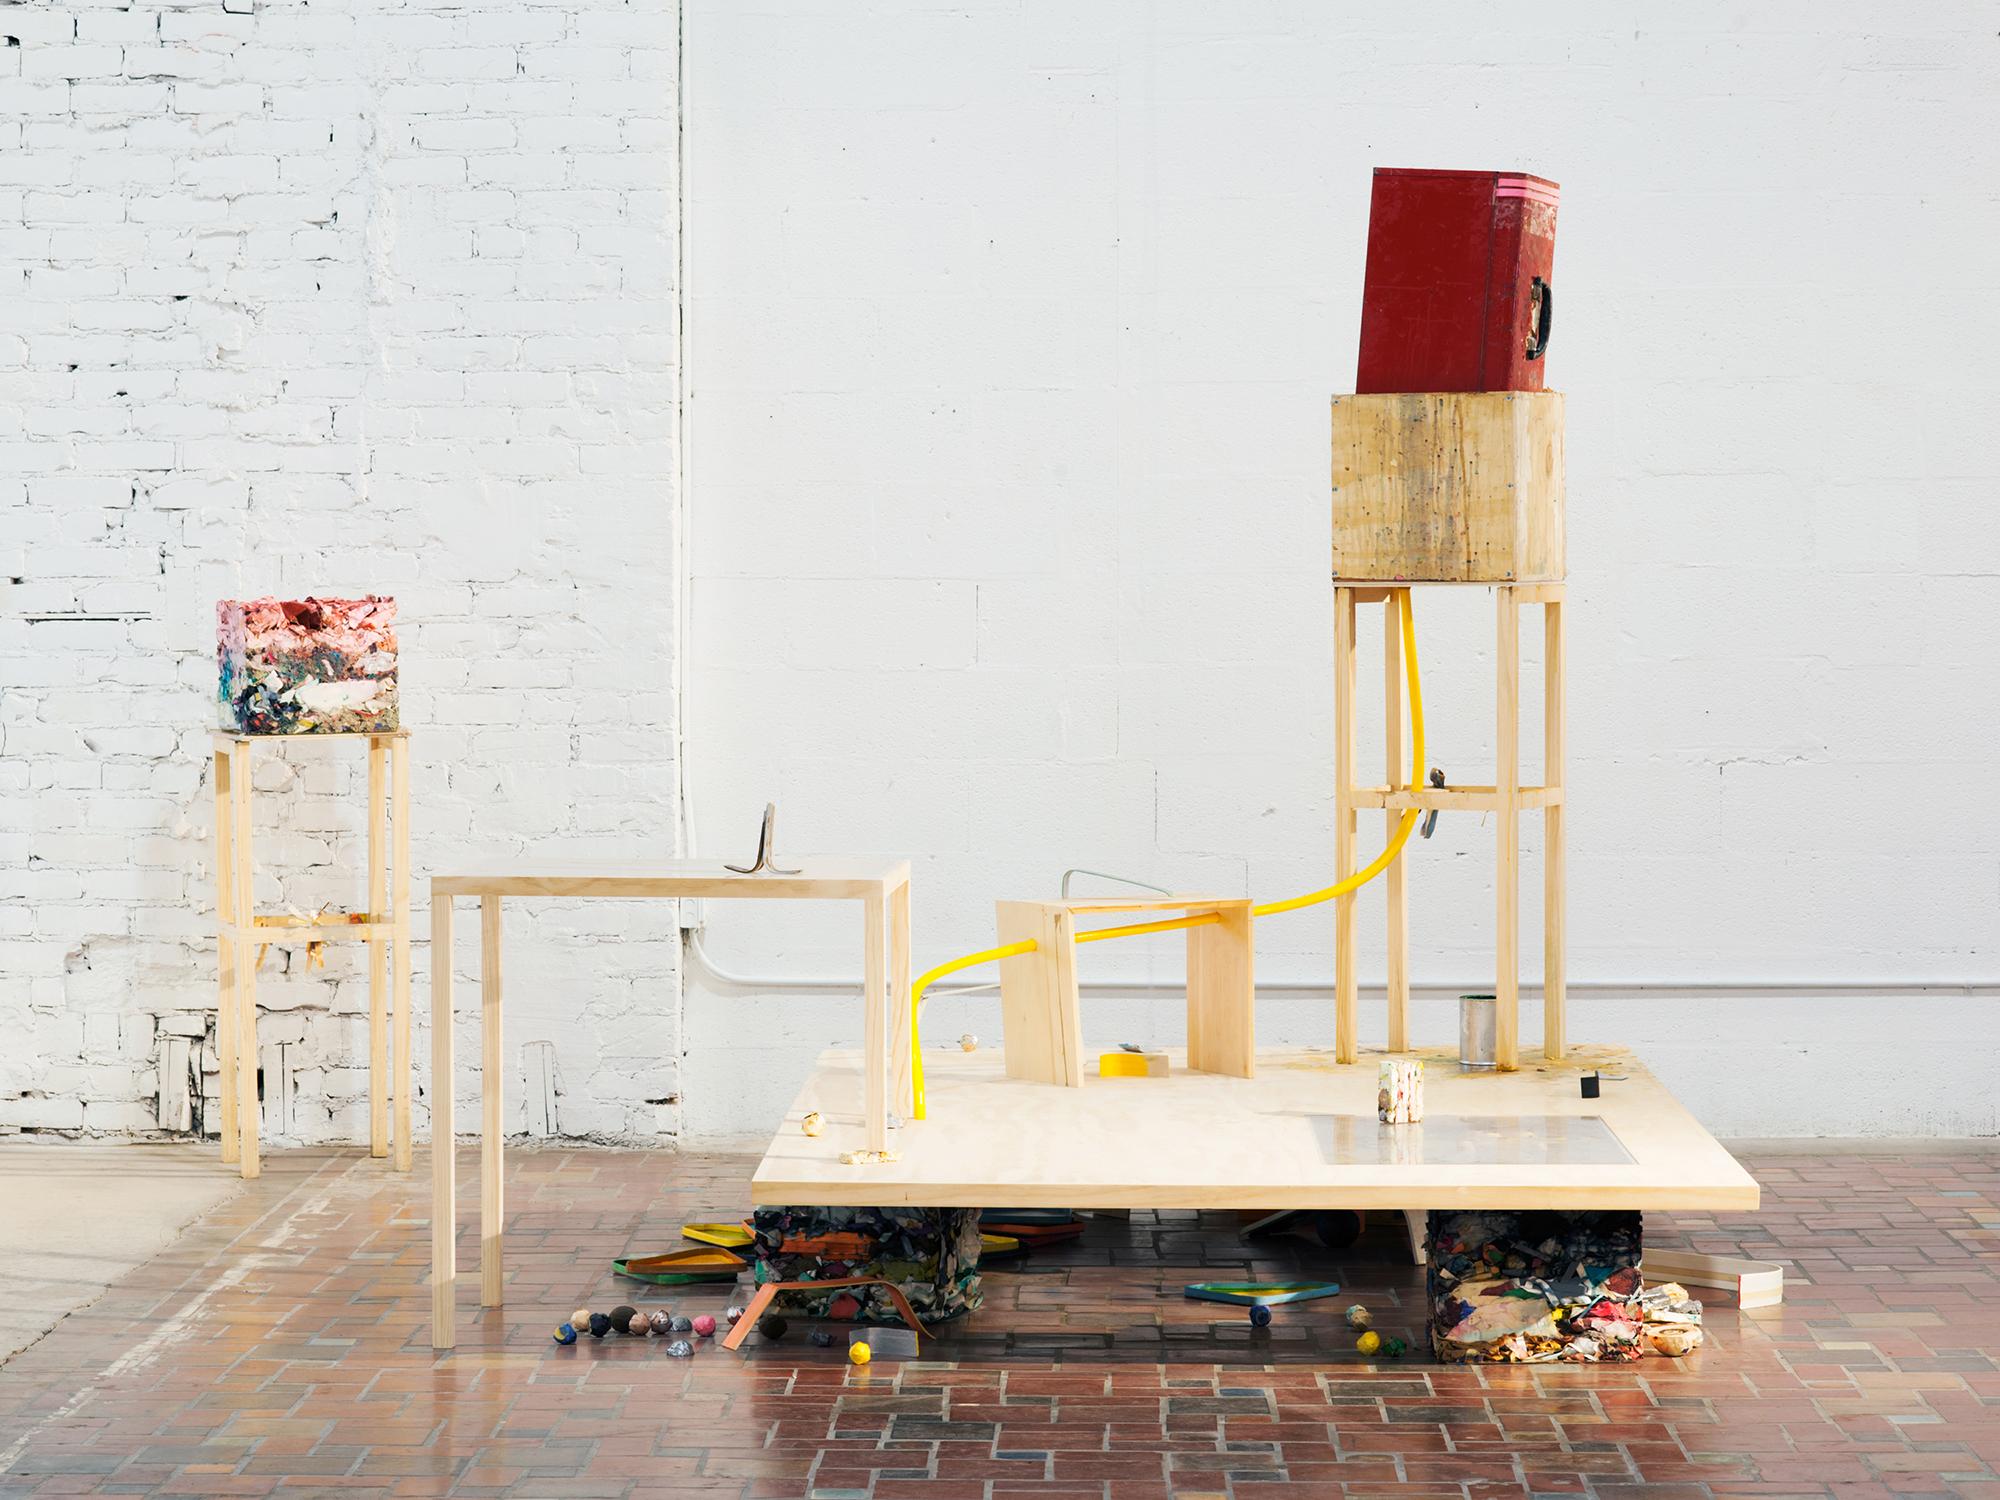 Museum of Contemporary Art Detroit installation for artist Terry Conrad, Detroit, MI